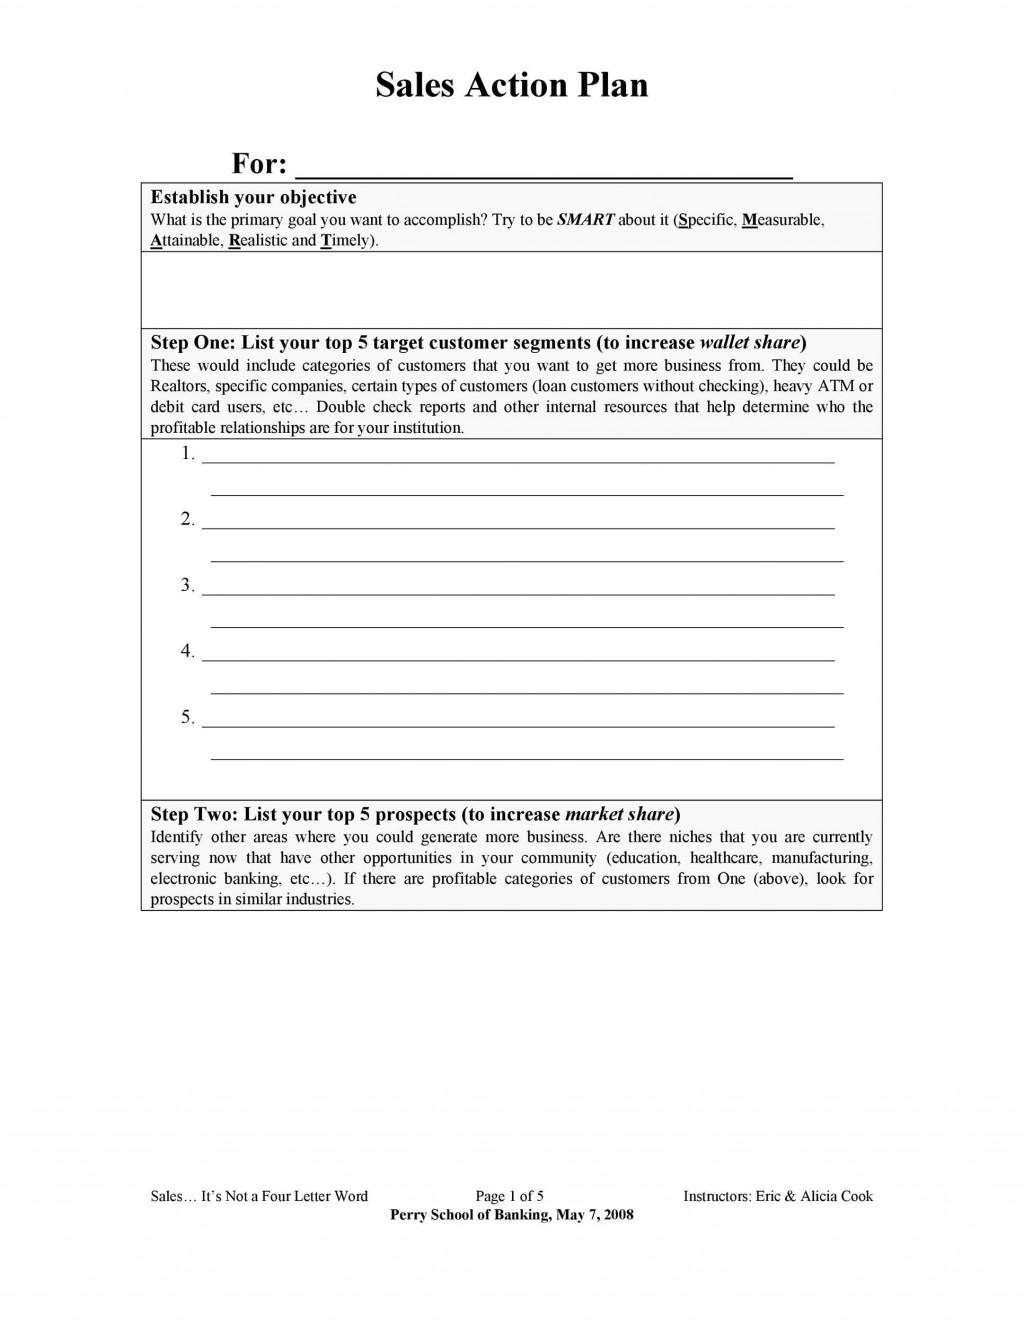 004 Stunning Sale Plan Template Word Concept  Compensation Free BusinesLarge